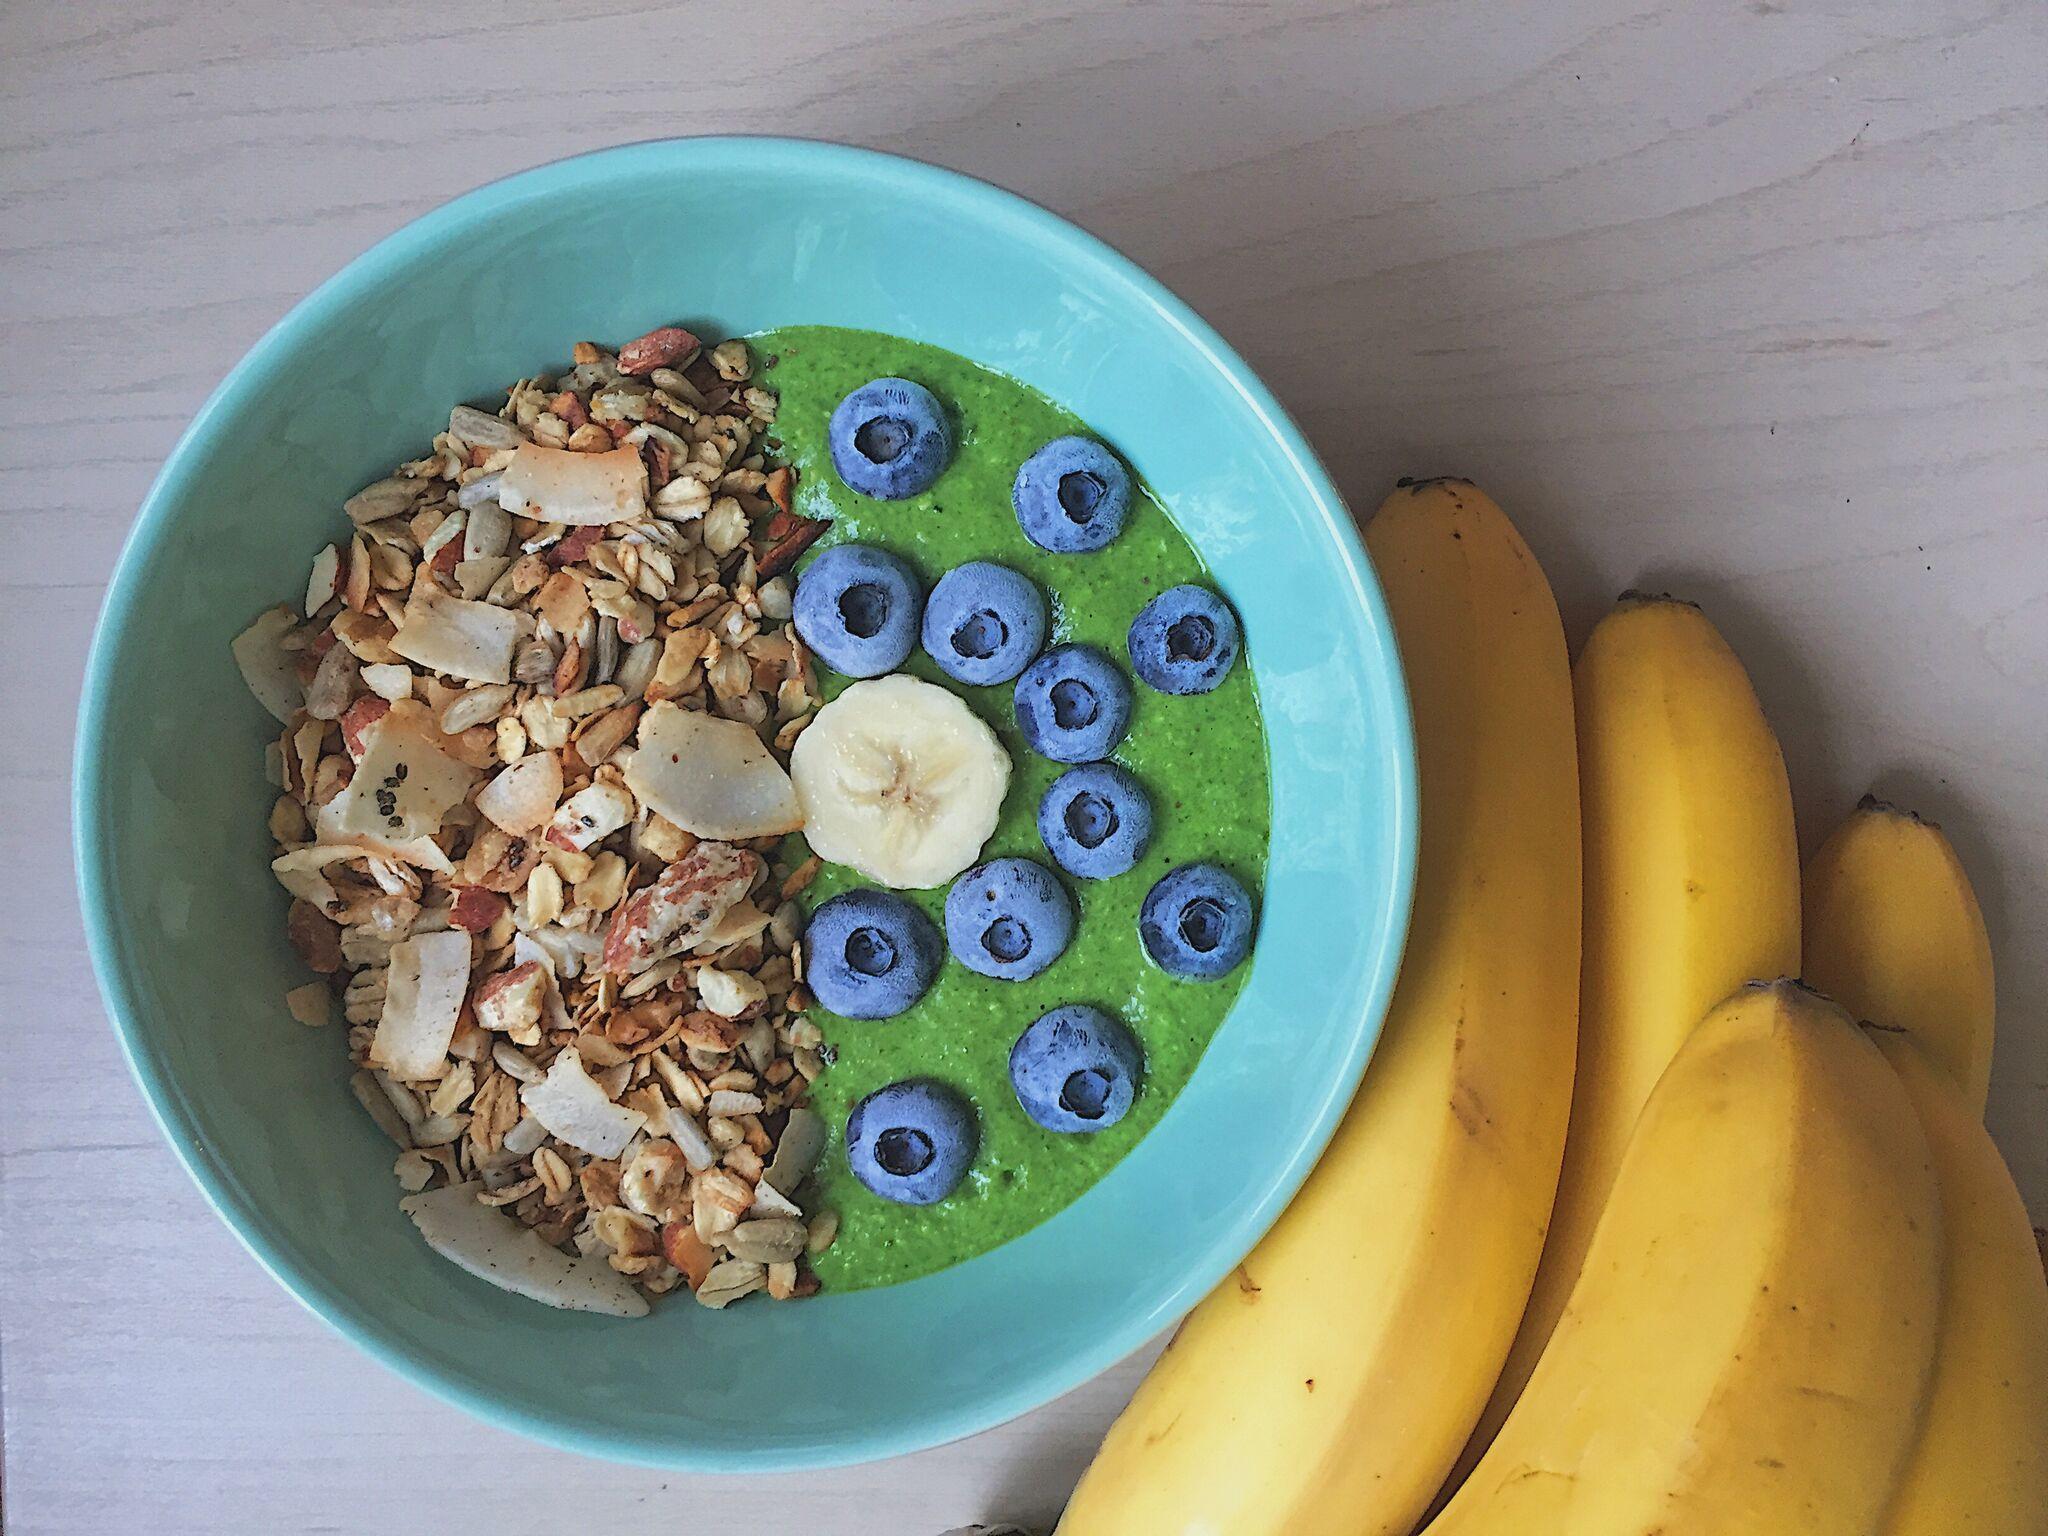 Creme de banana com espinafre, granola e blueberries